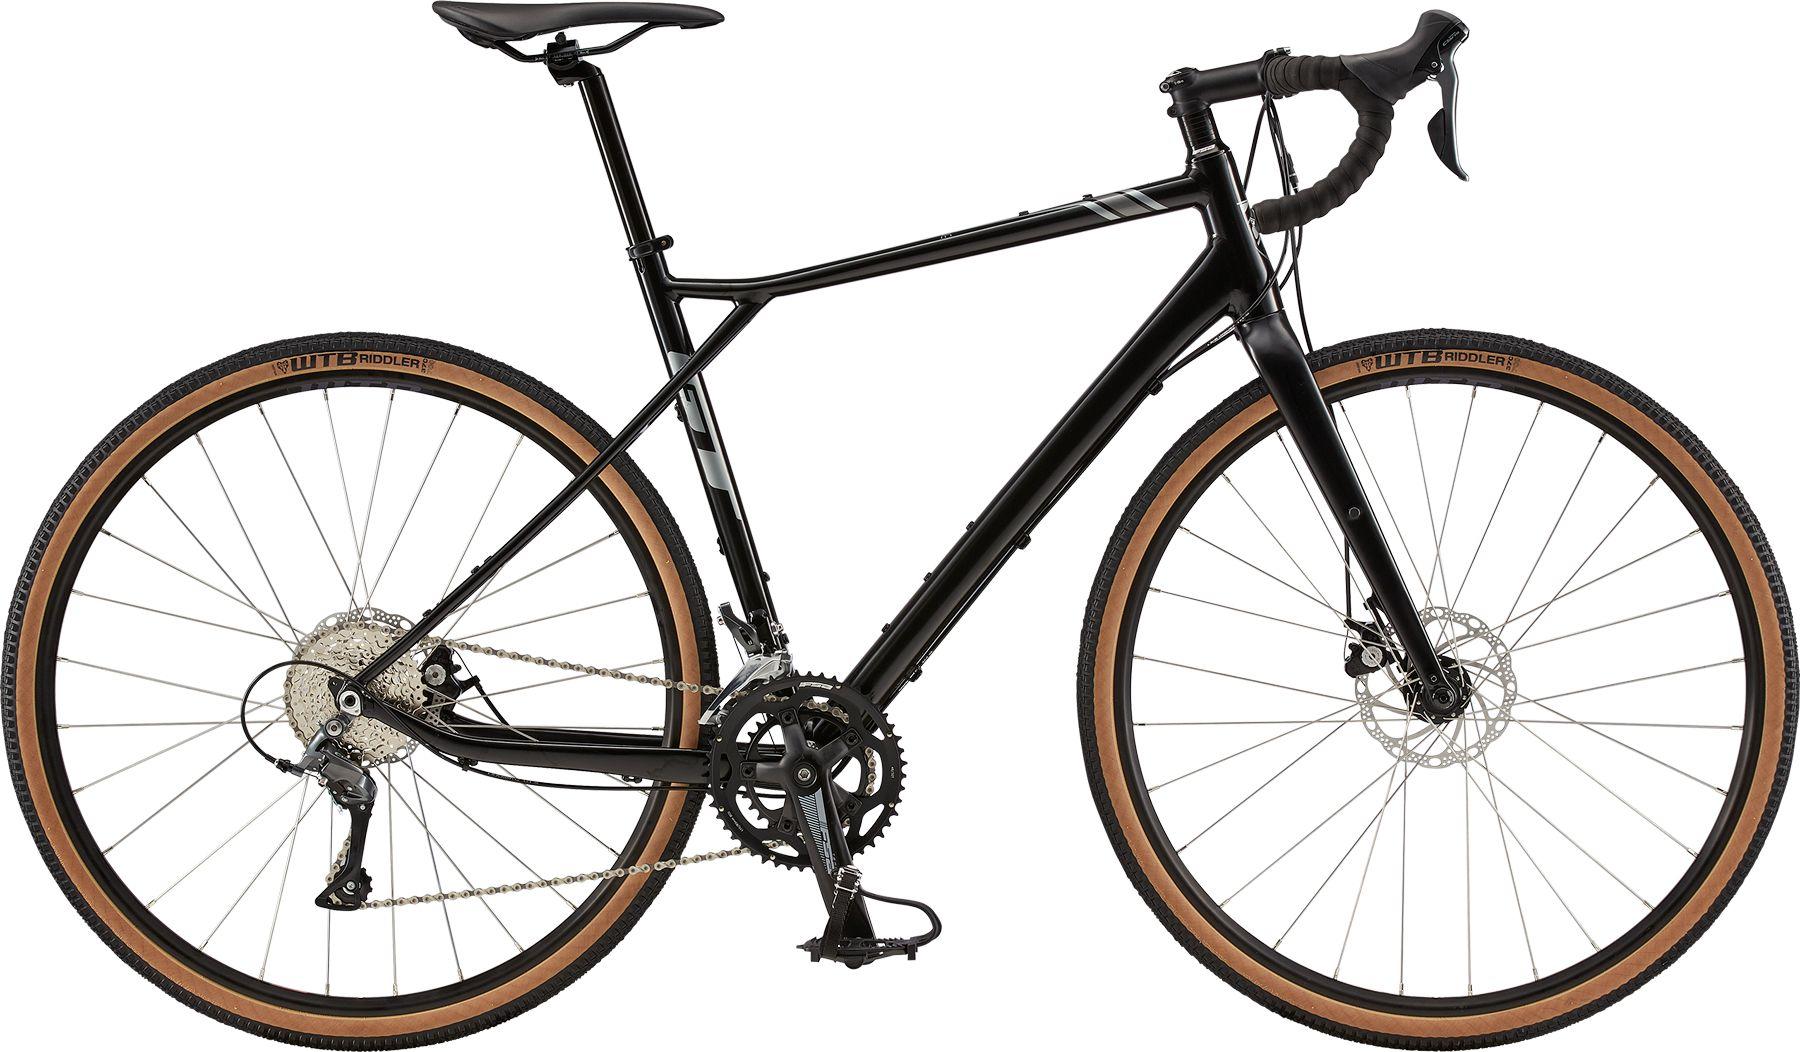 Gt Grade Elite Road Bike 2020 | Road bikes